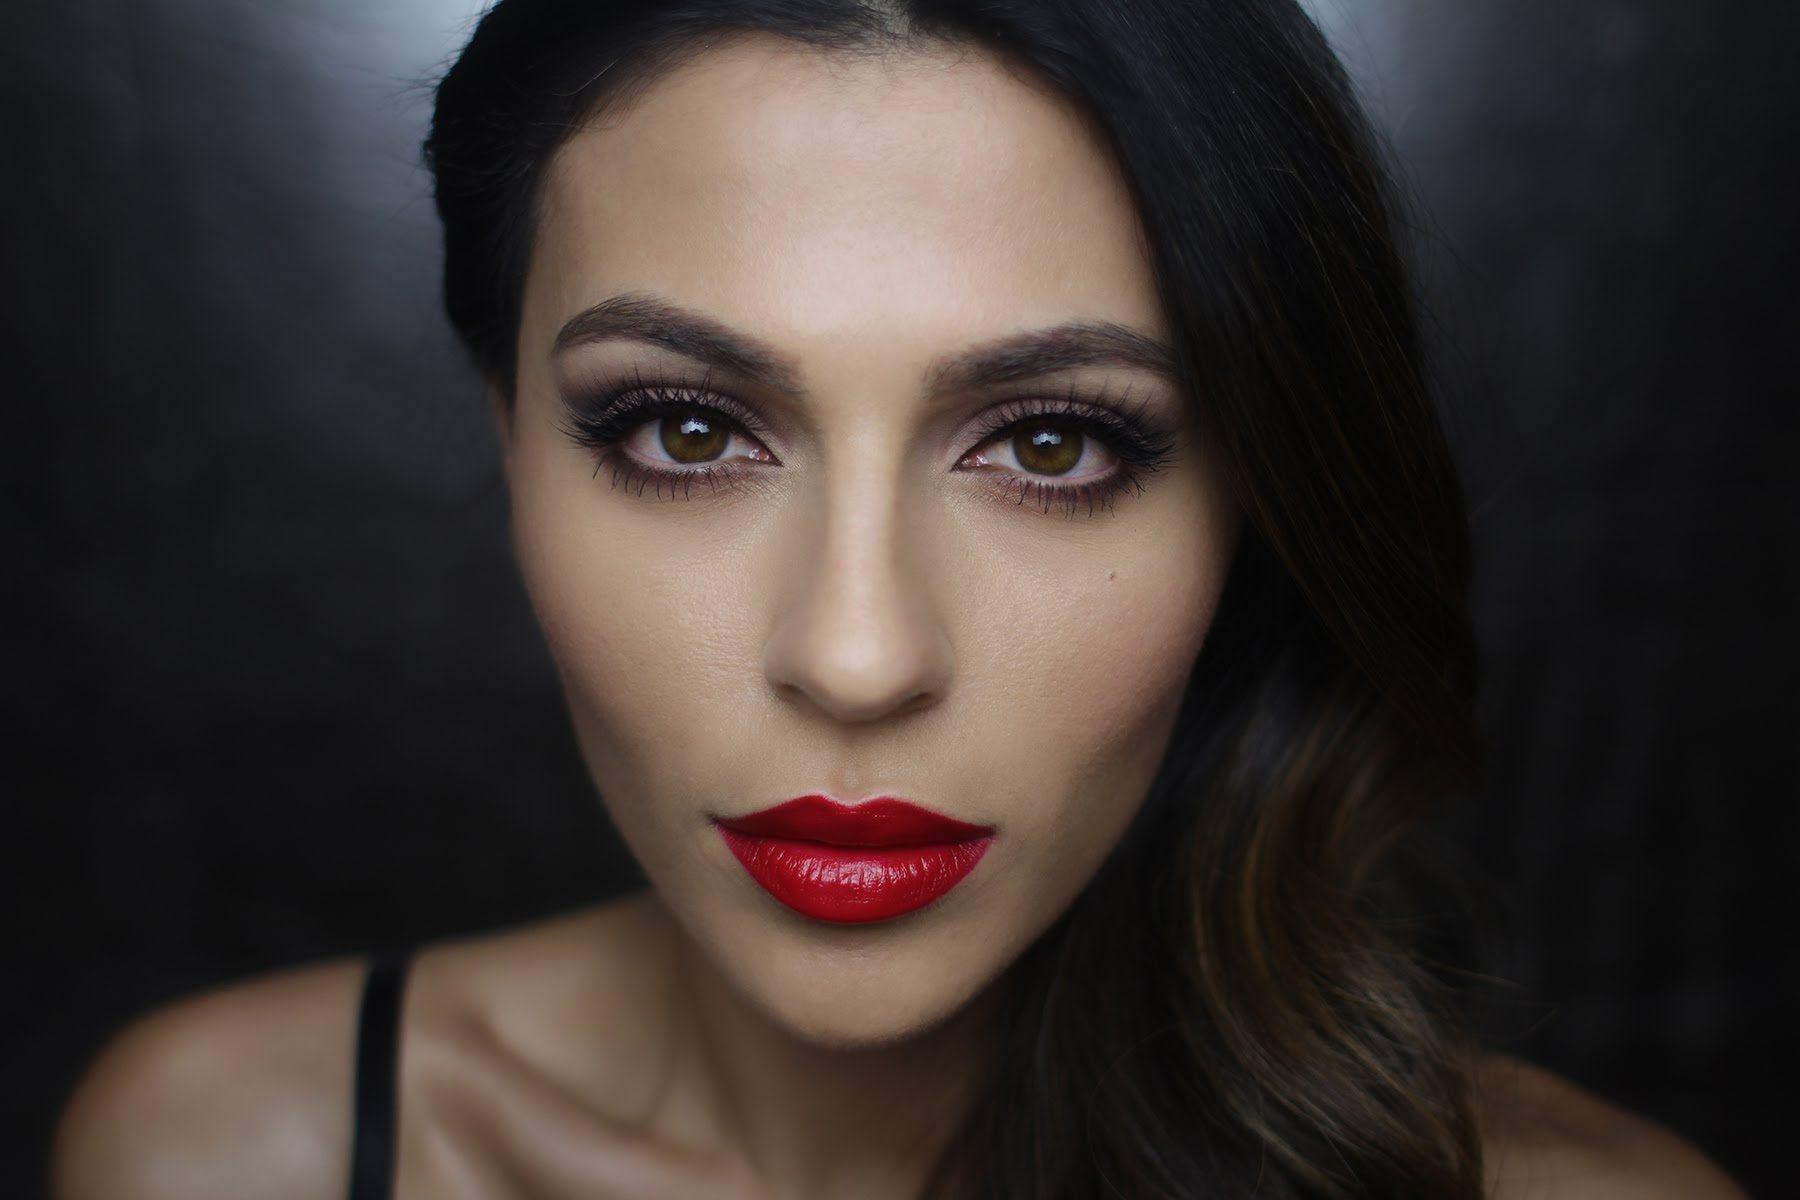 Teni Panosian's 'Wearable Maleficent Inspired Makeup